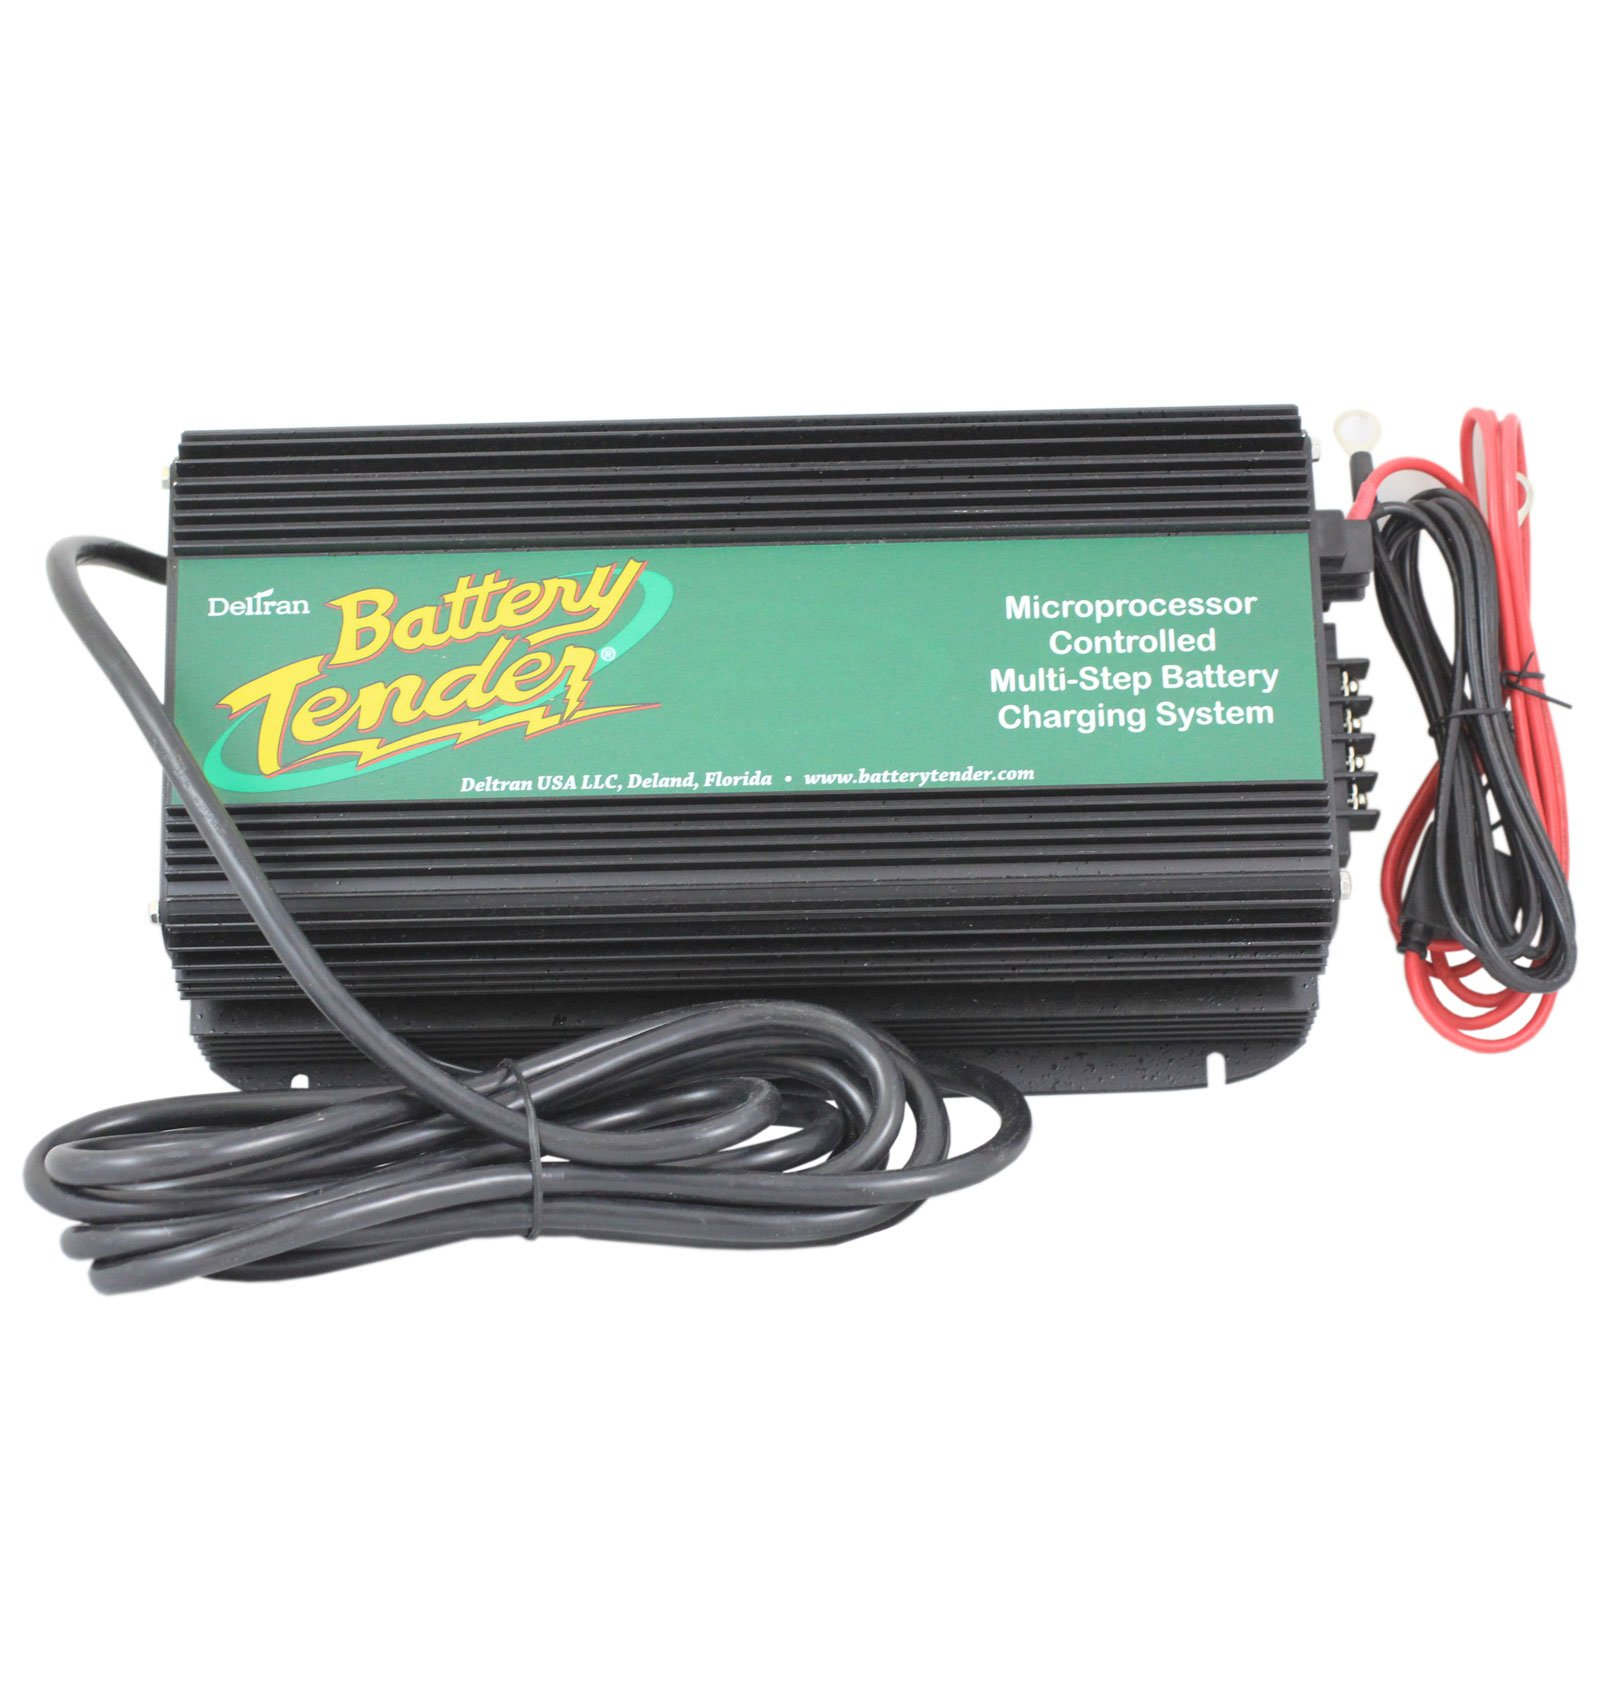 Lm350 12 Volt Battery Charger